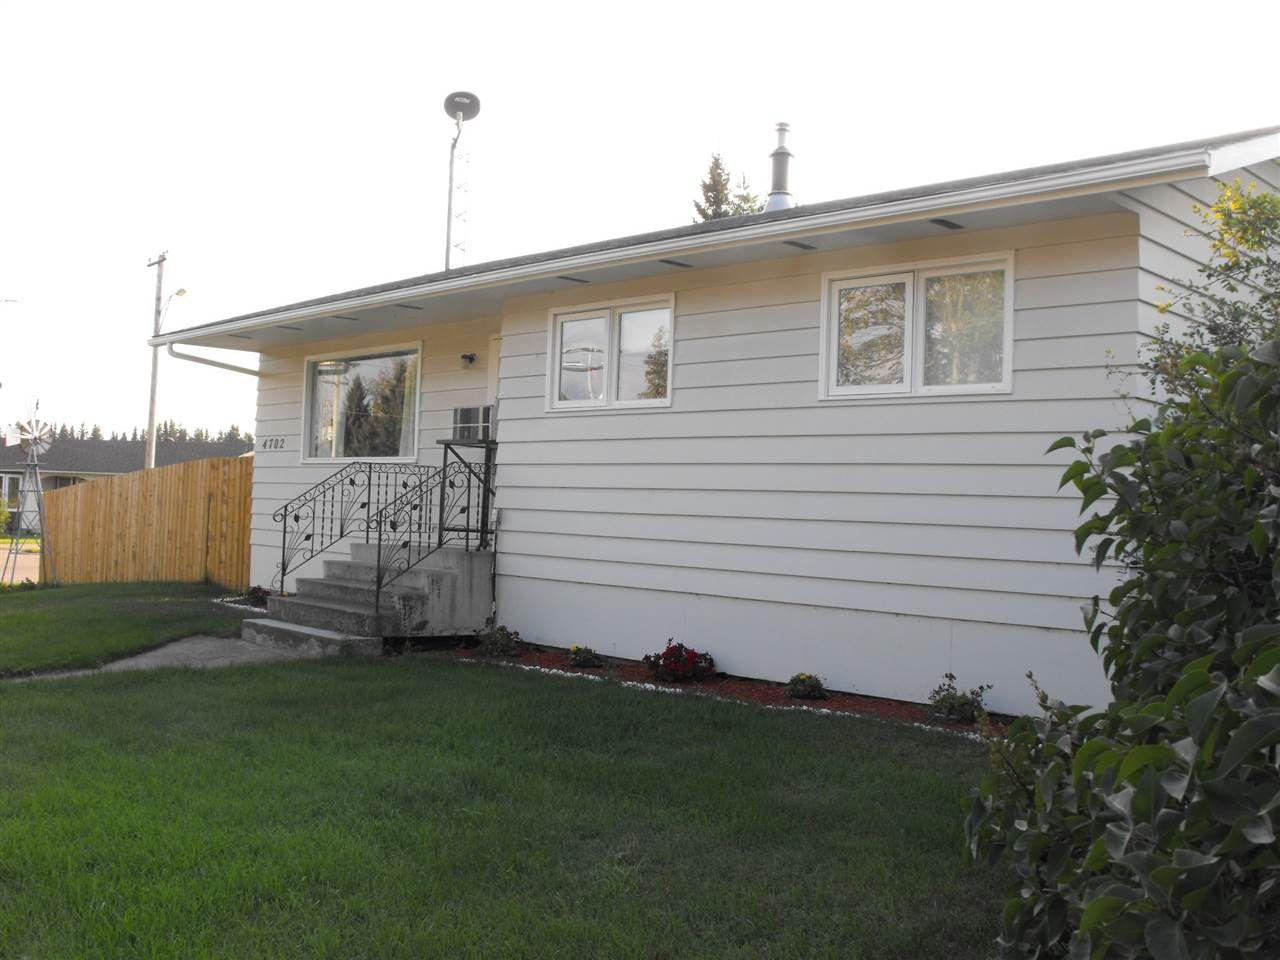 Main Photo: 4702 50 Street: Myrnam House for sale : MLS®# E4127458